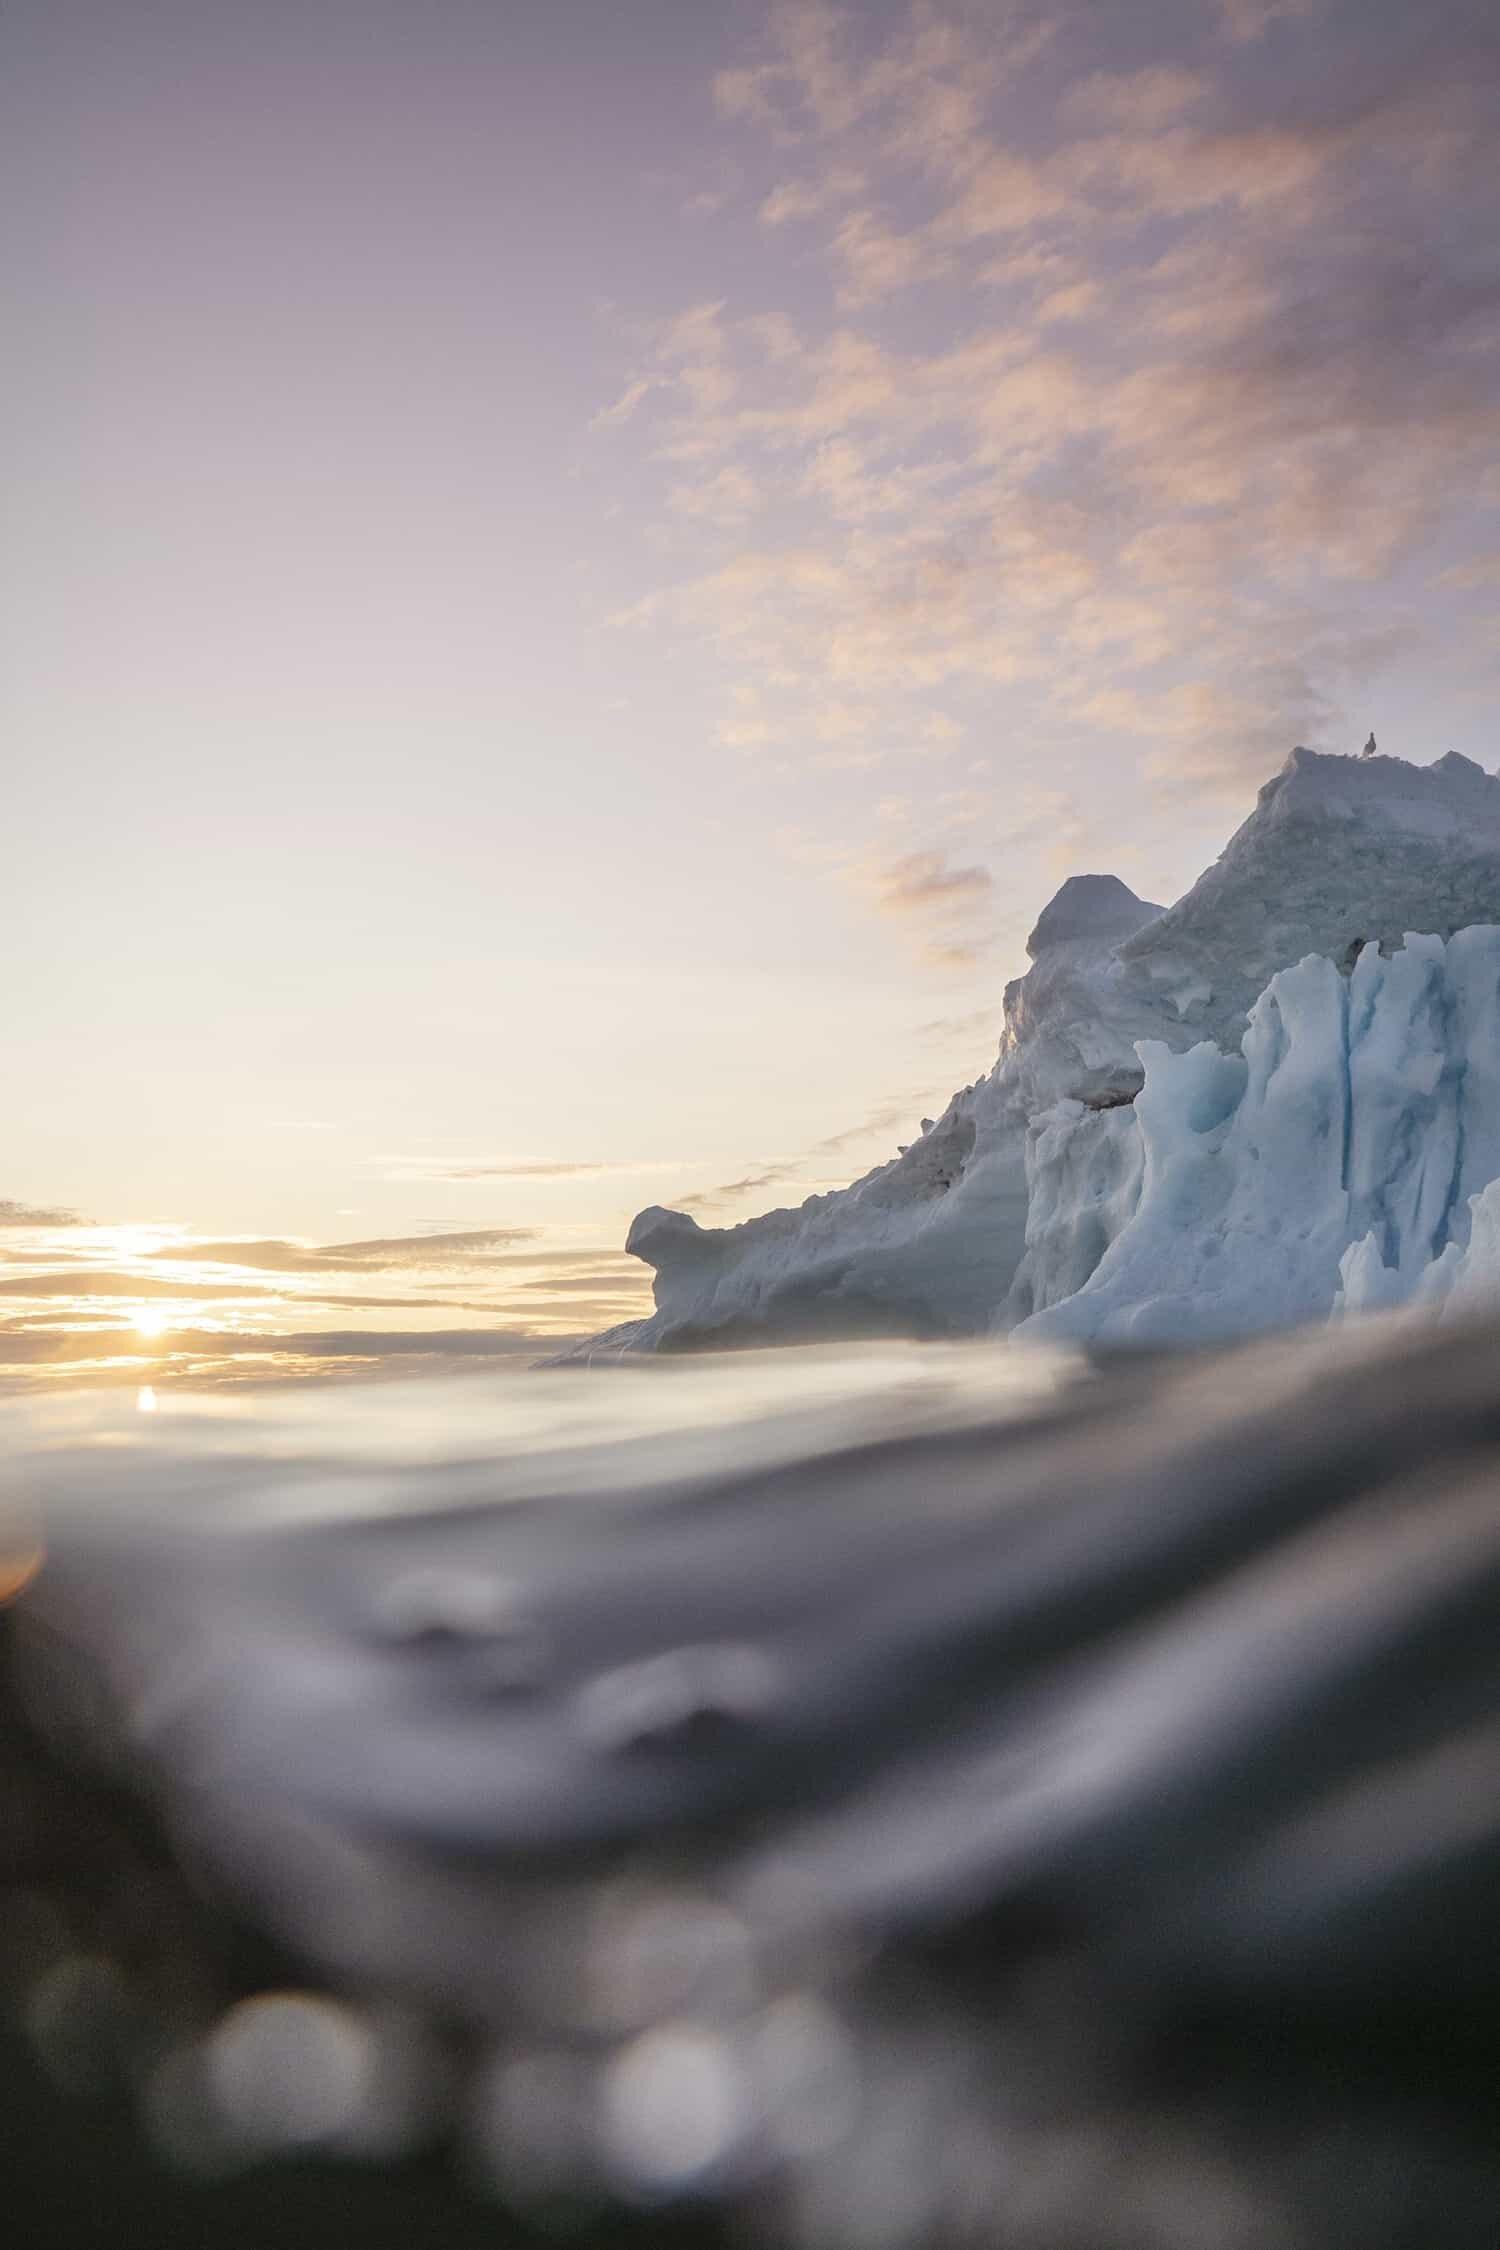 Underwater Photograph of Icebergs - Ilulissat, Greenland